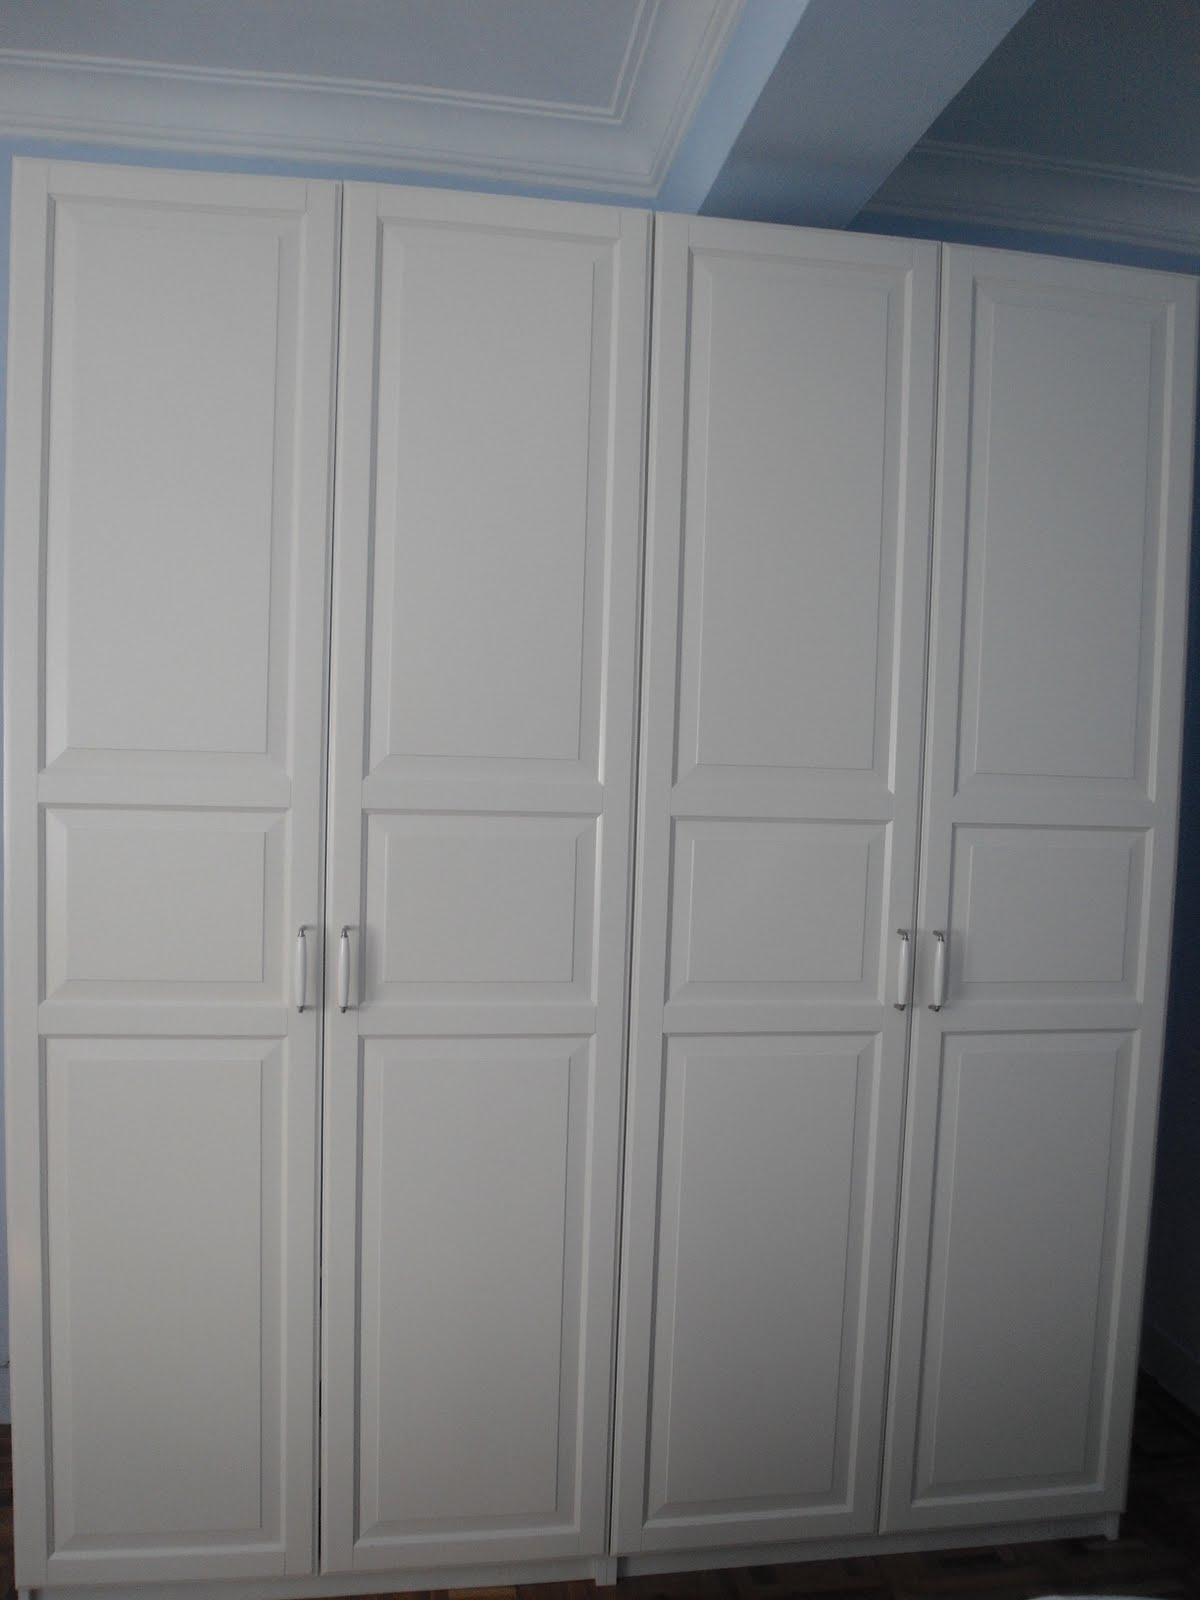 Adesivo Decorativo De Parede Cozinha ~ Decoracion mueble sofa Armarios para ninas